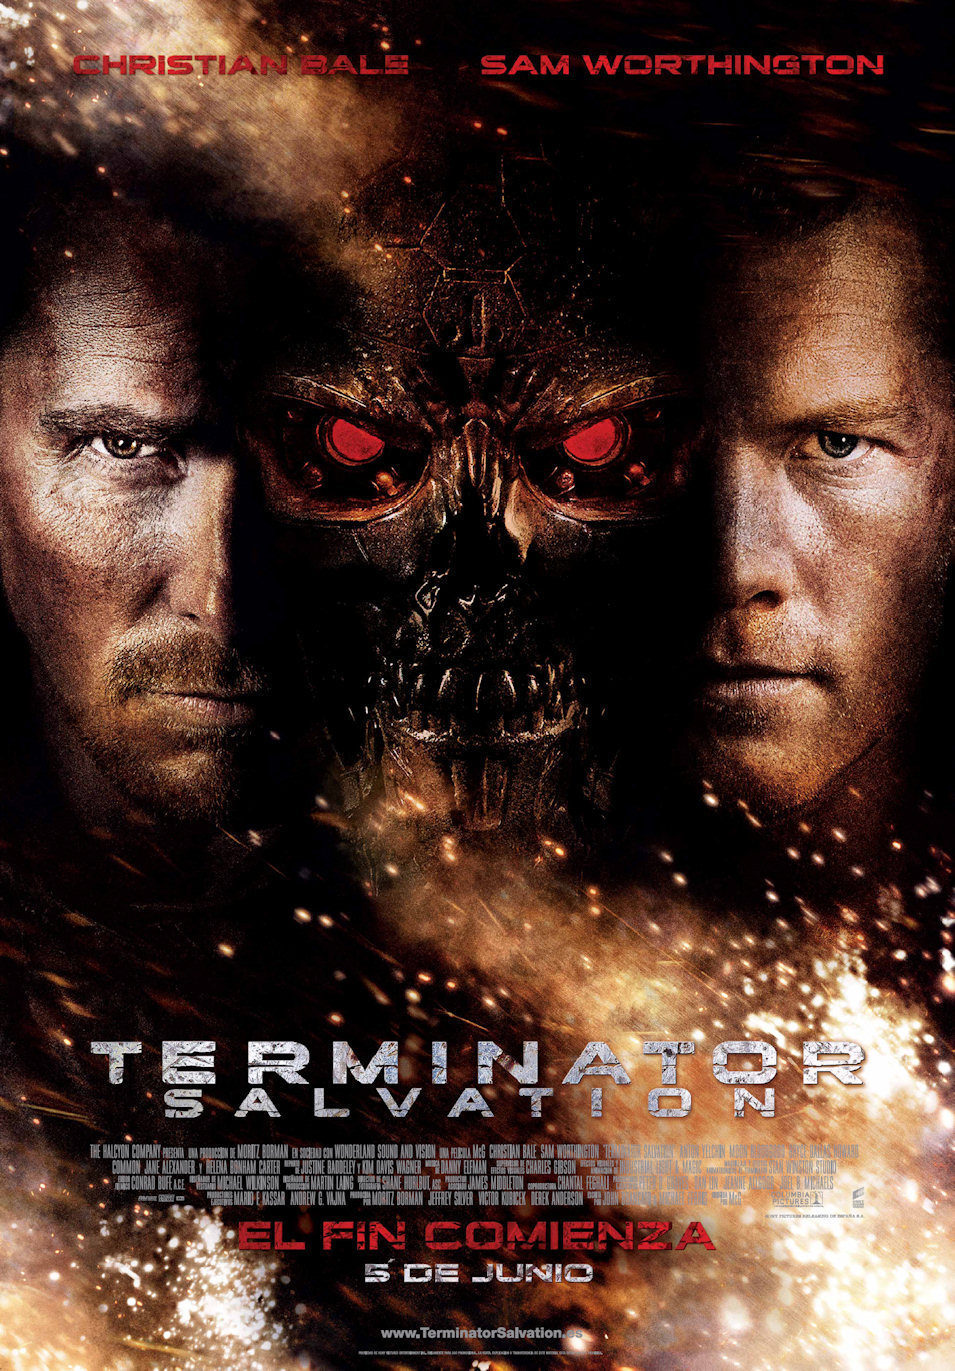 Cartel España de 'Terminator Salvation'